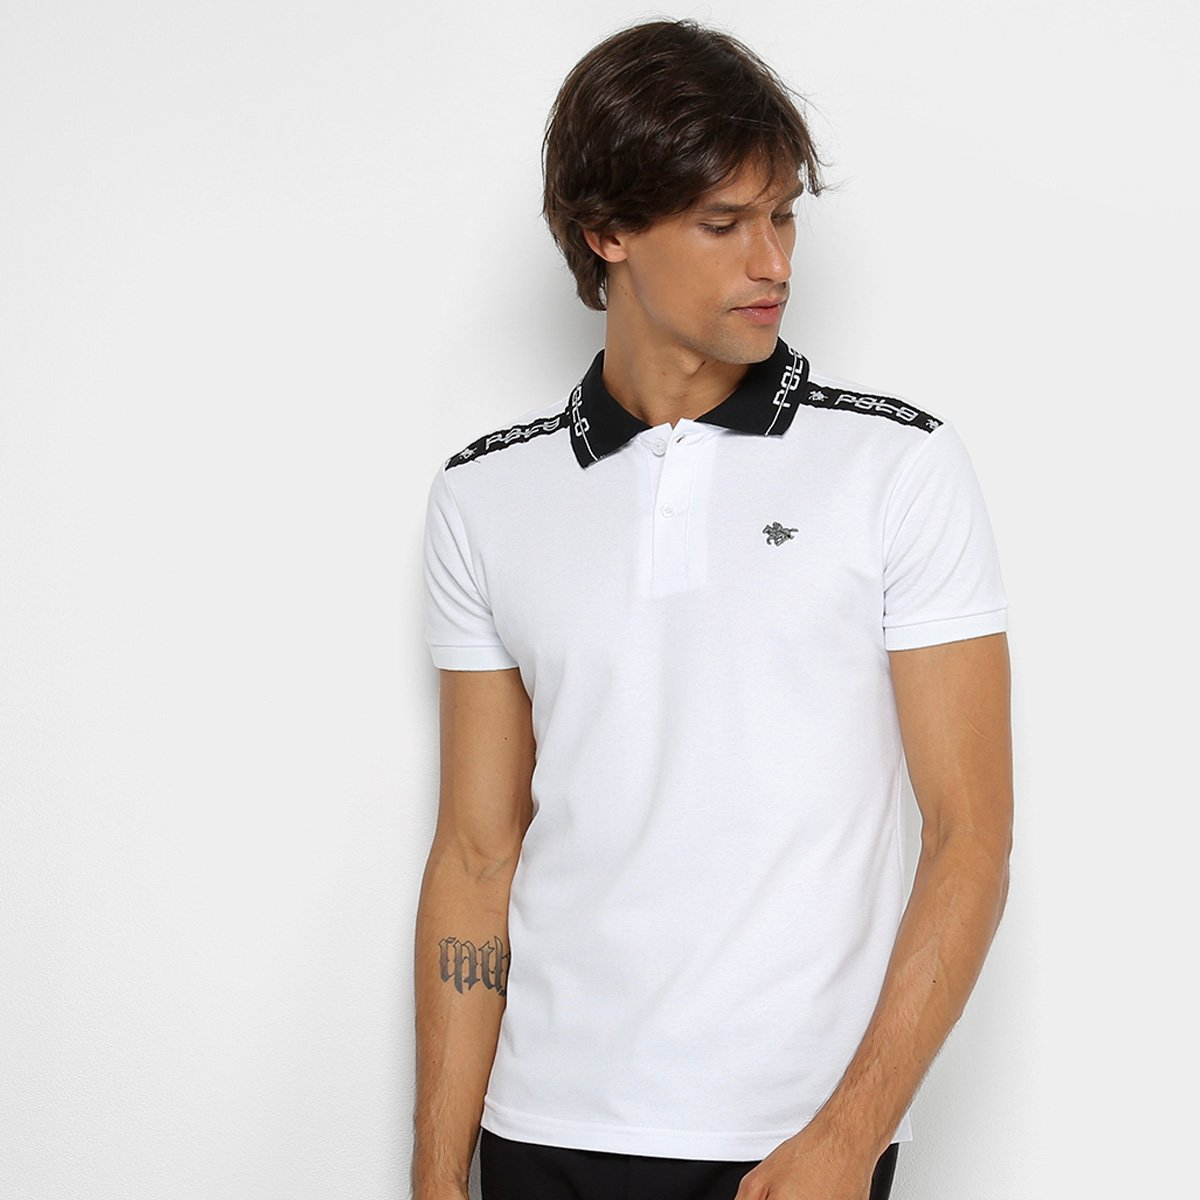 Camisa Polo RG 518 Recorte Estampado Masculina. undefined b8ab1ad6eb8a2